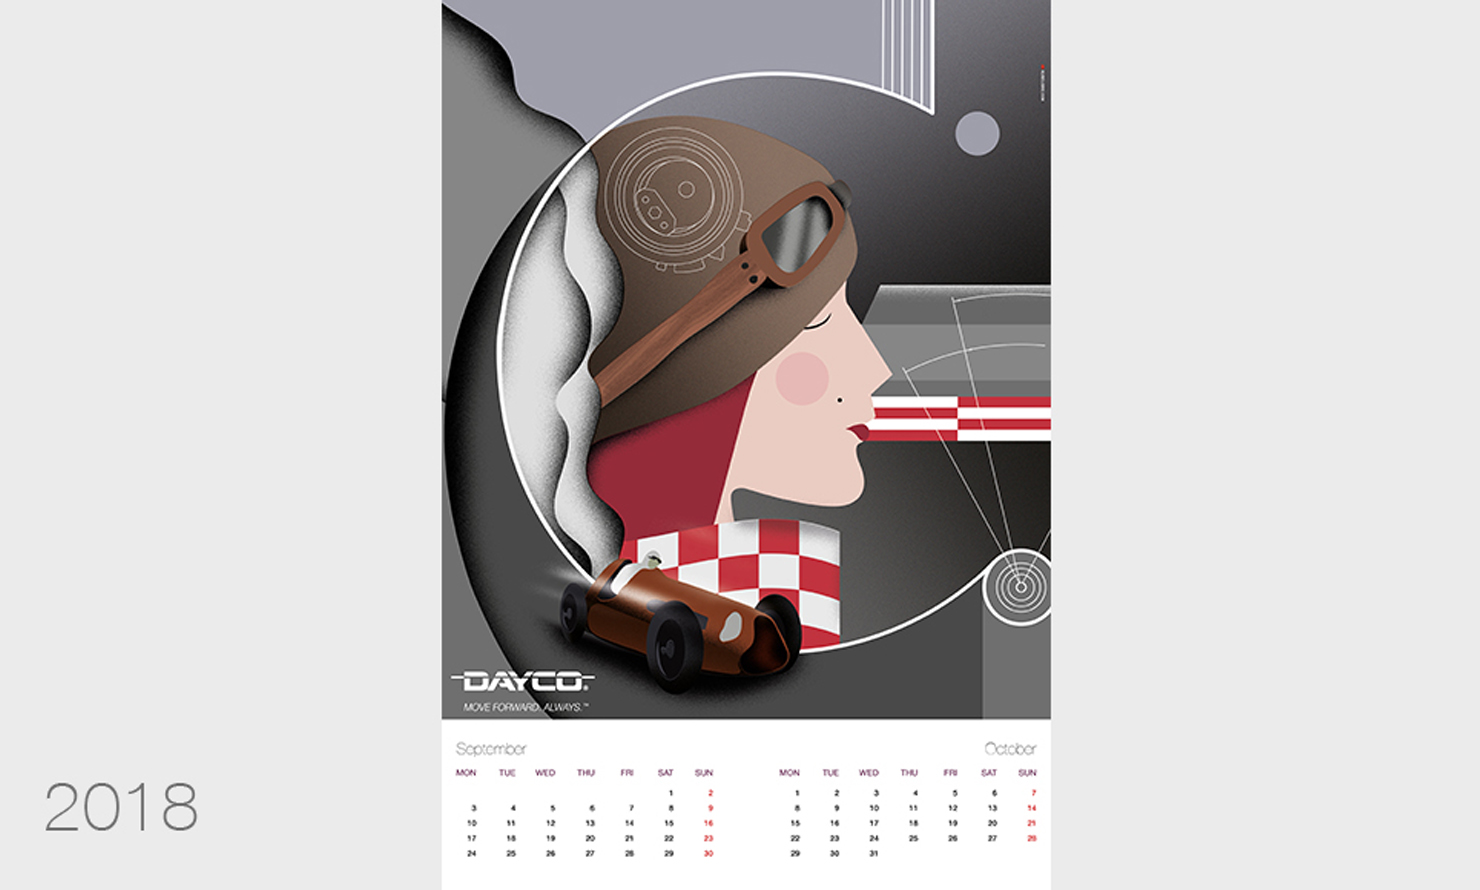 https://kubelibre.com/uploads/Slider-work-tutti-clienti/dayco-calendario-2018-5.jpg